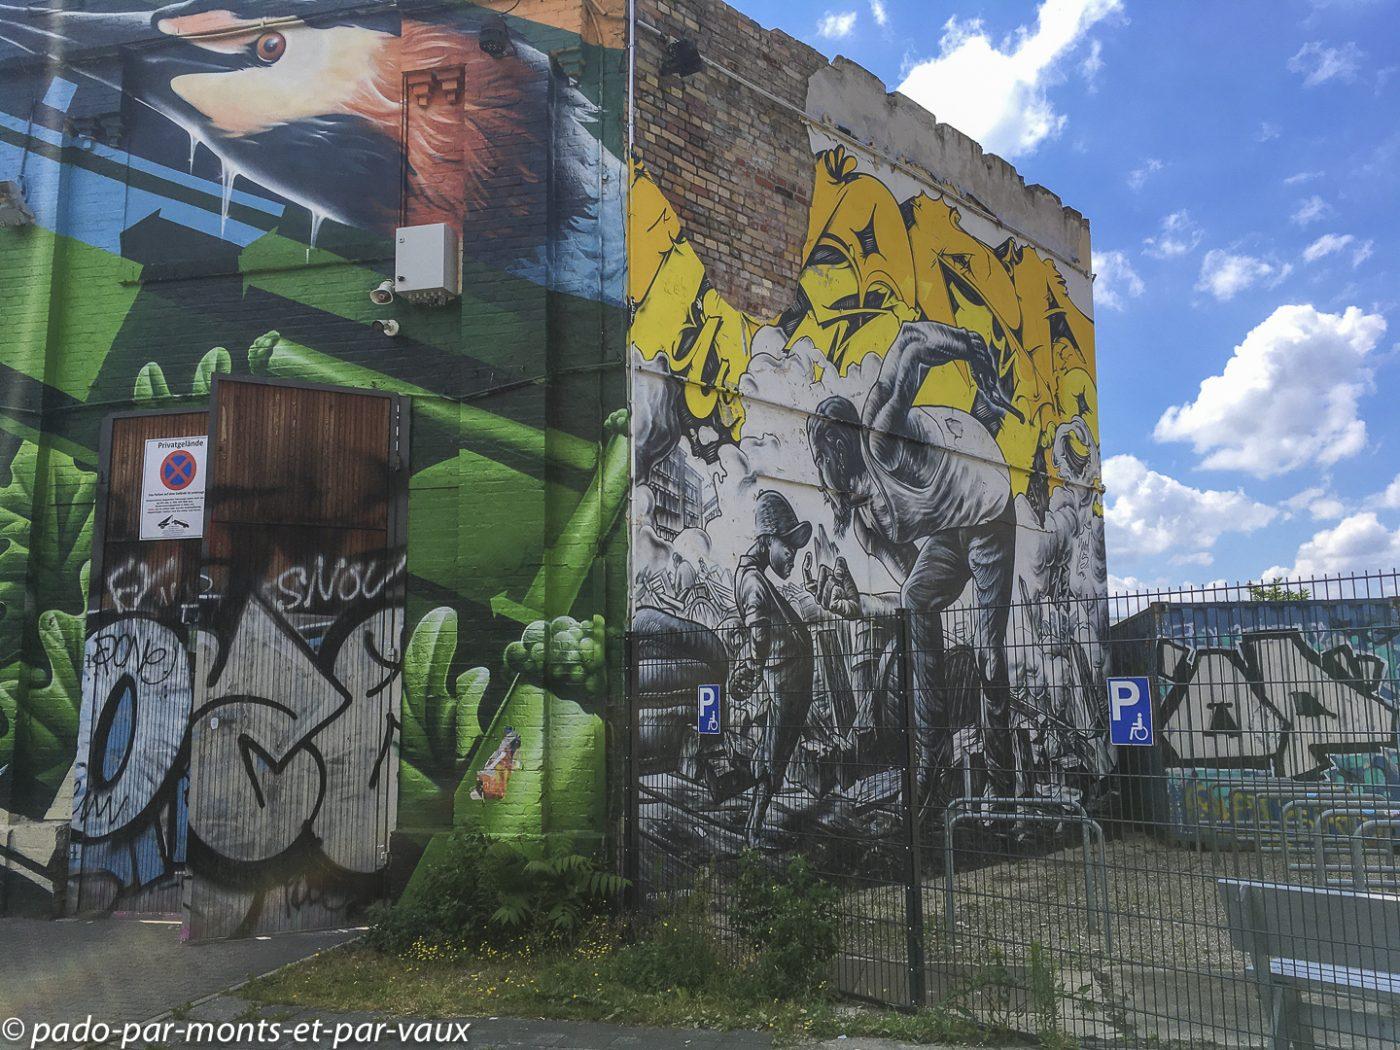 Street art Berlin - Raw Gelände